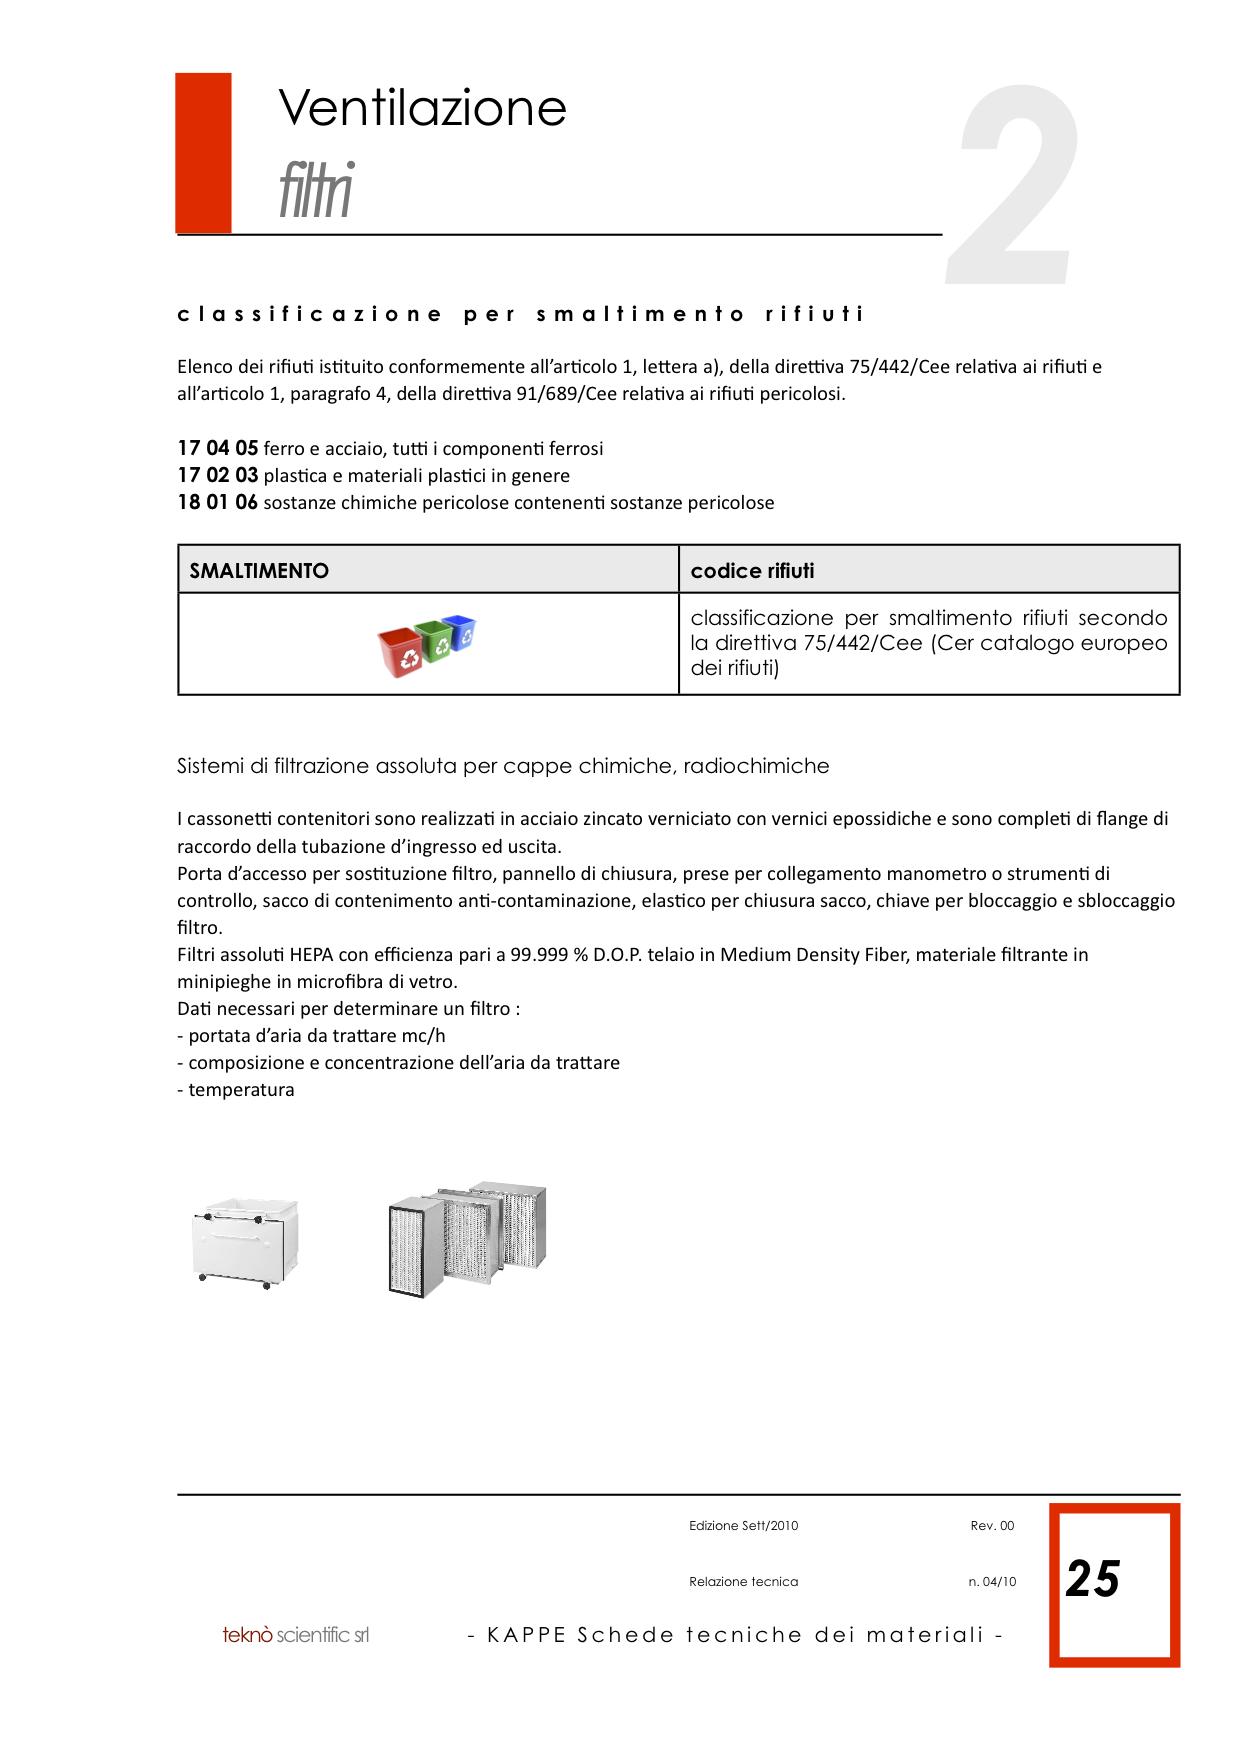 KAPPE Schede tecniche materiali copia 5.png